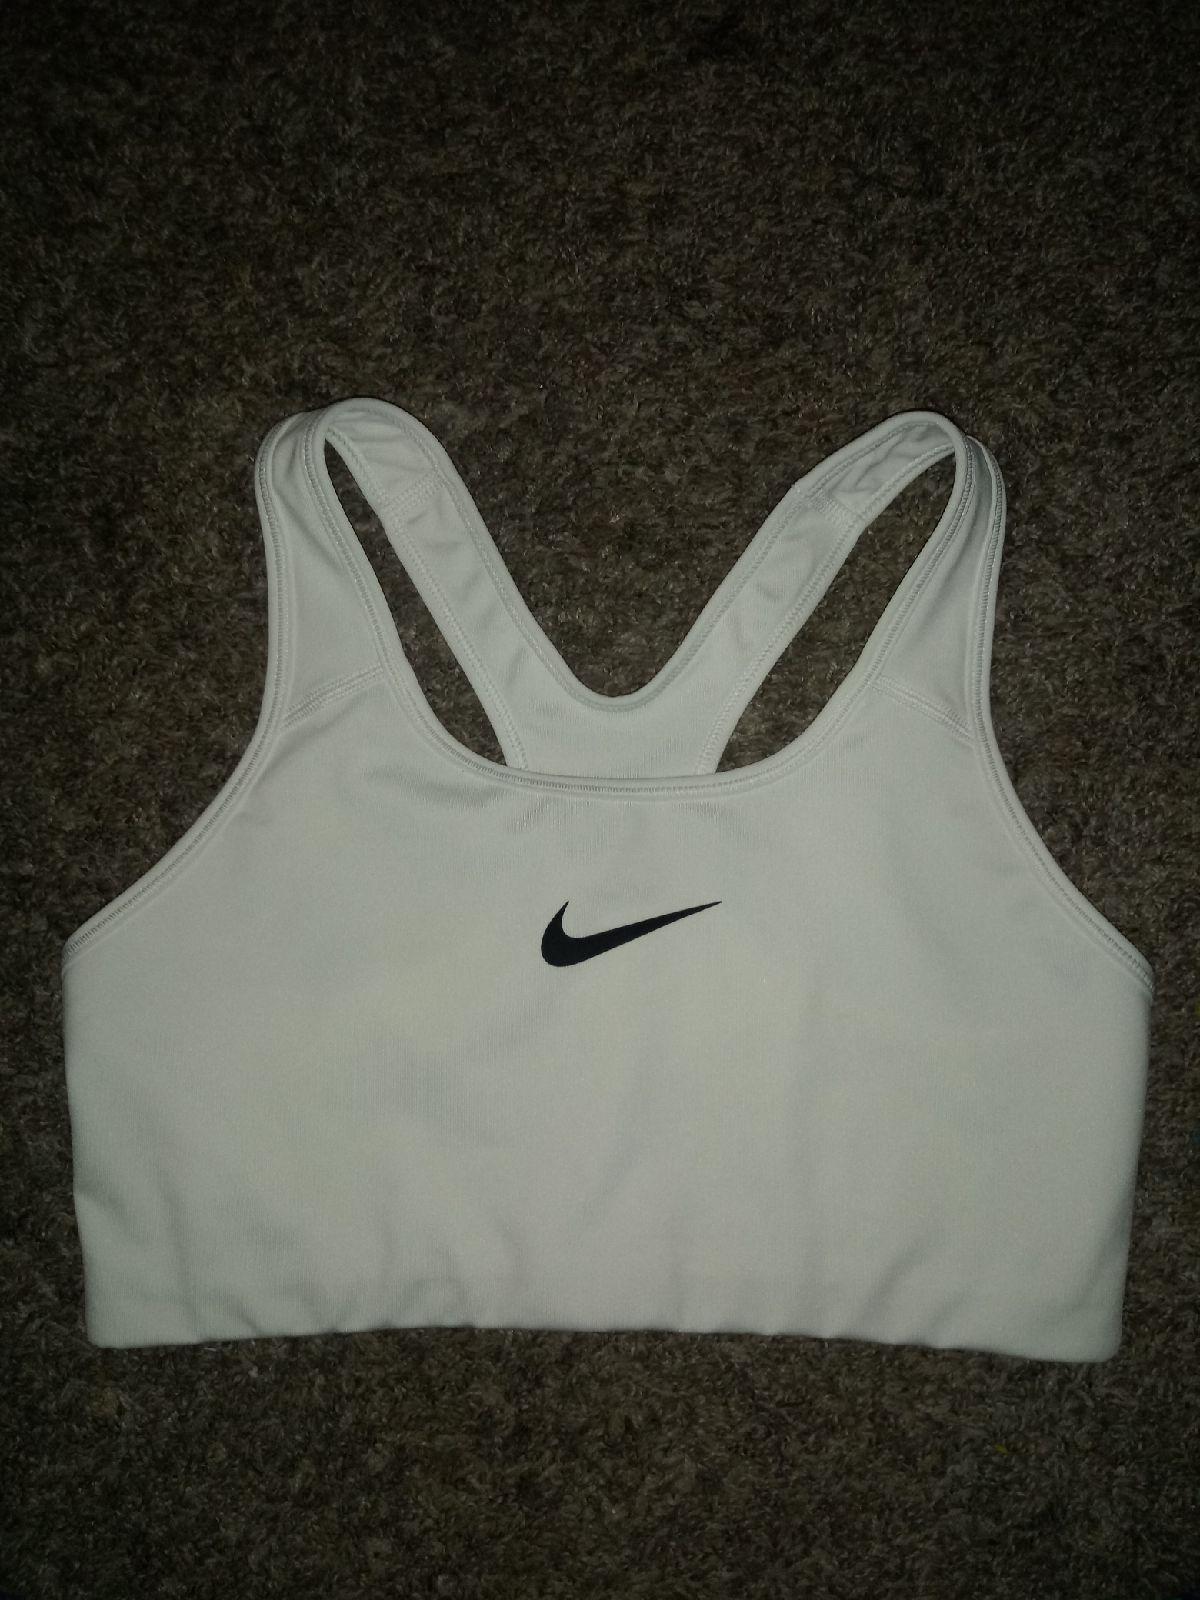 Womens size Large Nike DriFit bra. White with black logo